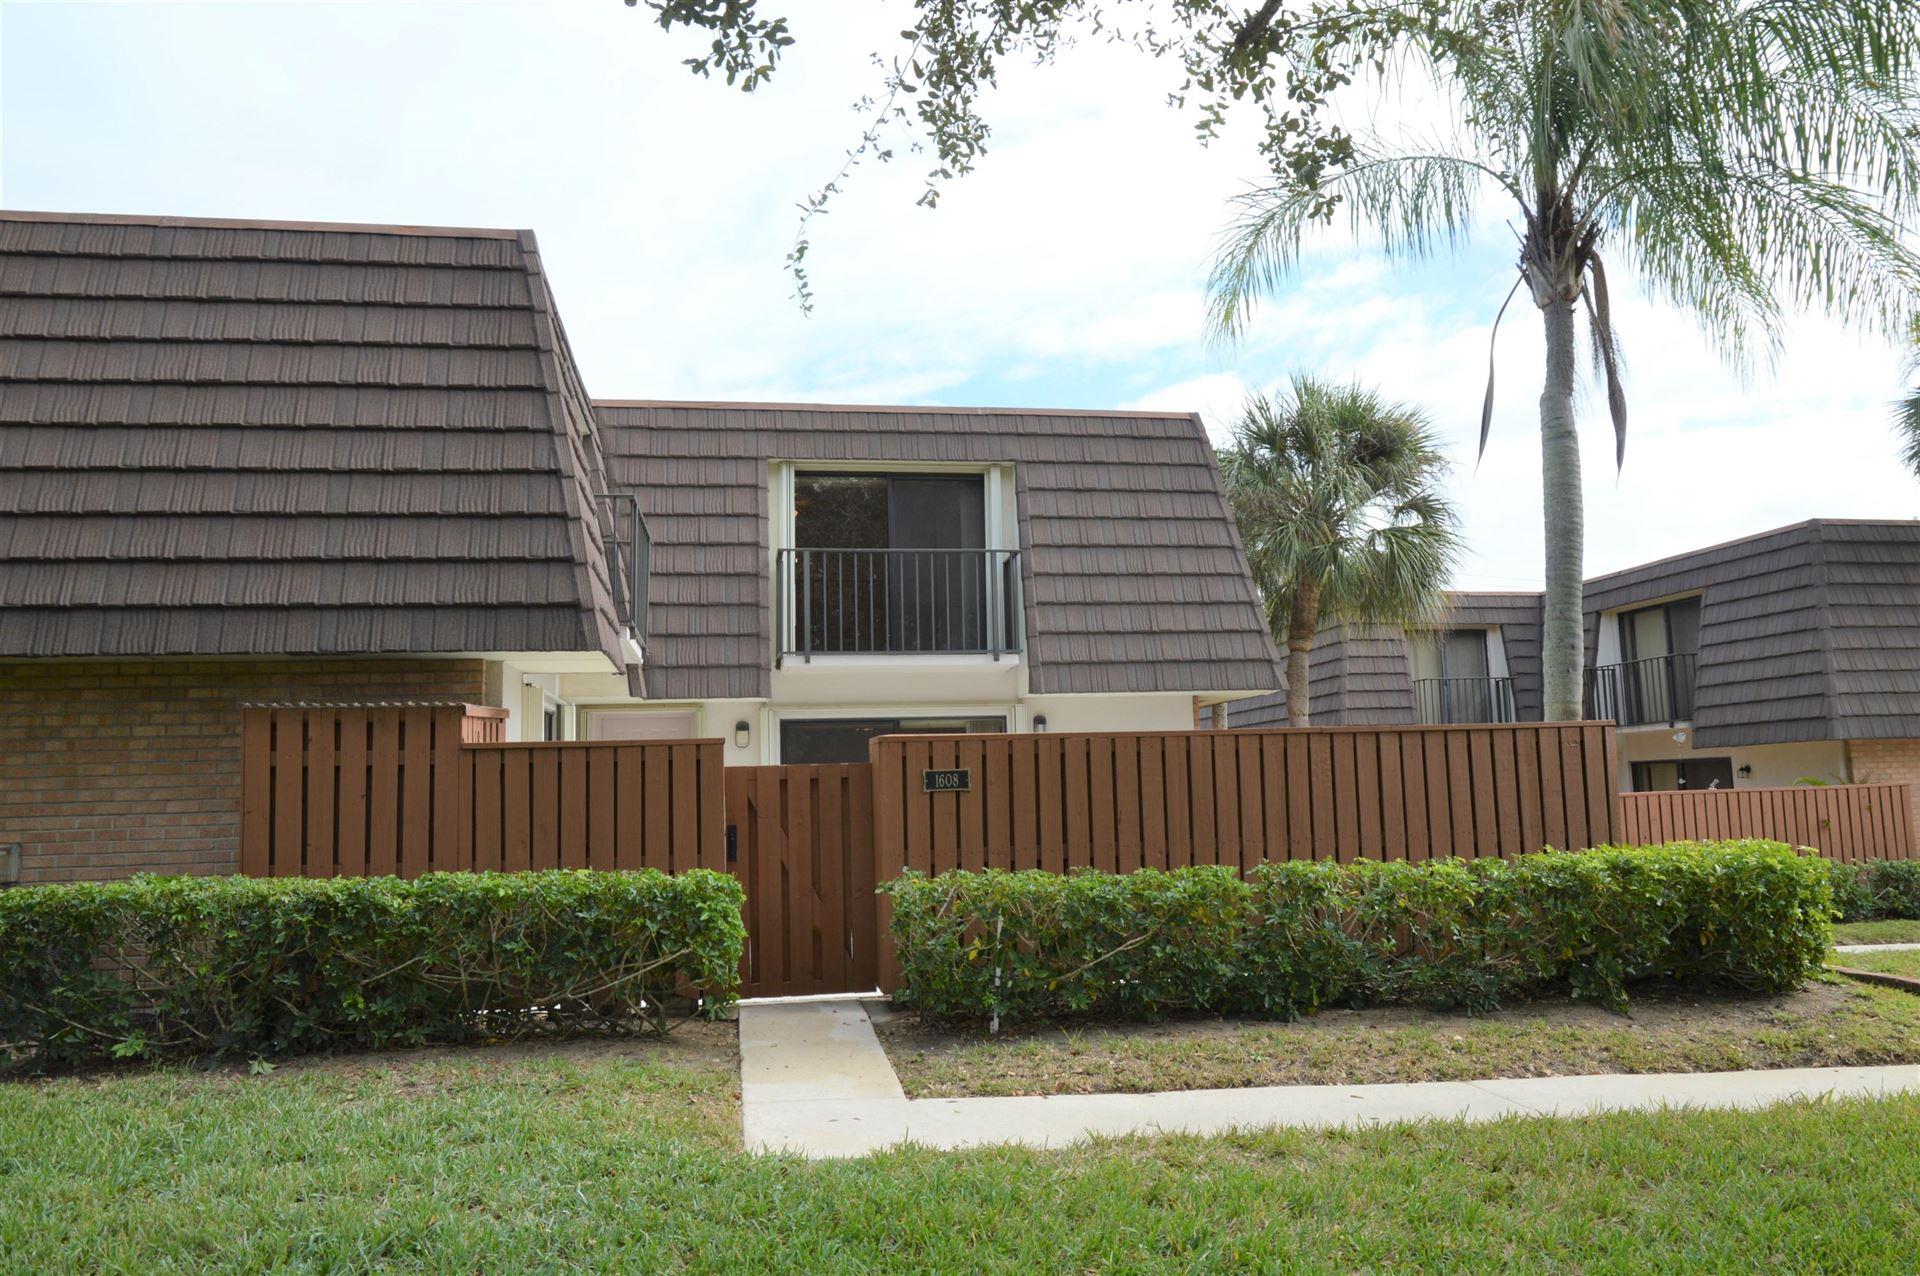 Photo of 1608 16th Court #25a, Jupiter, FL 33477 (MLS # RX-10678007)